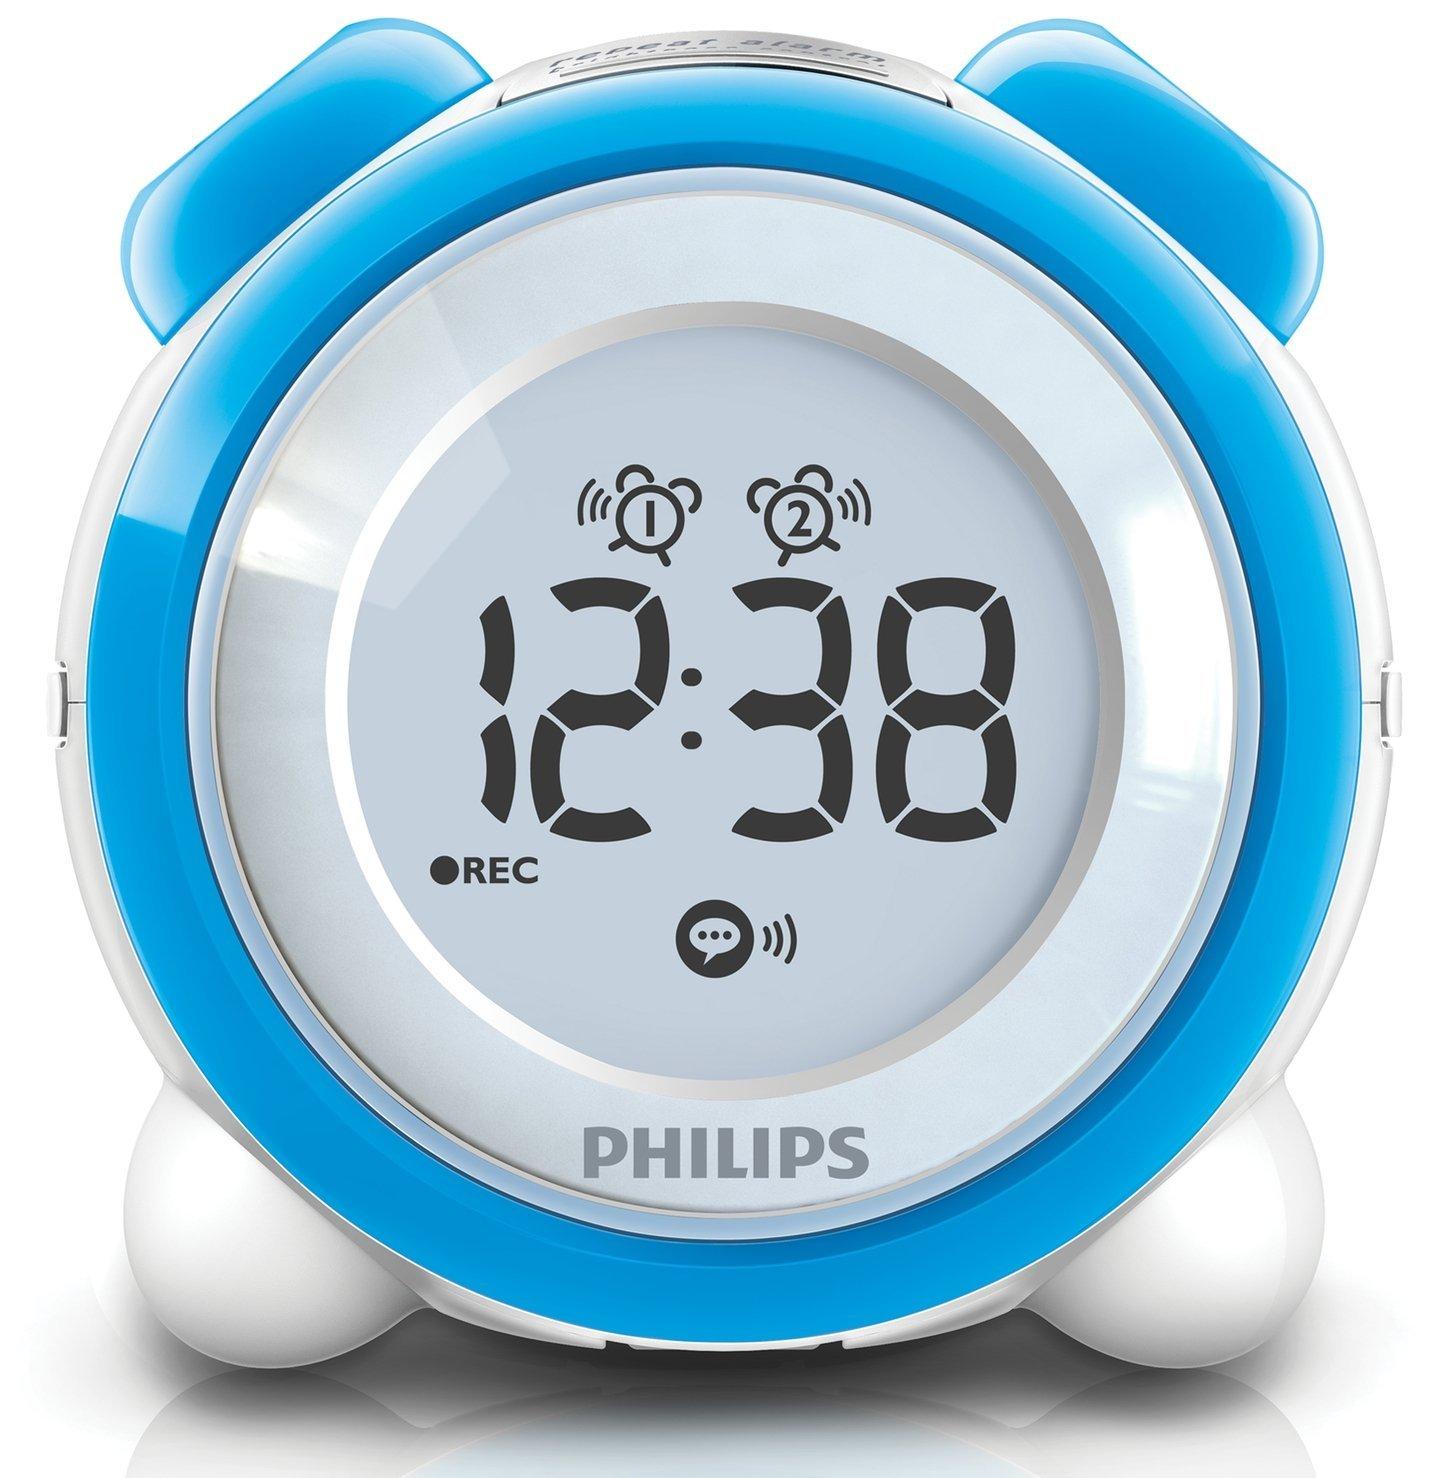 philips aj3138 digital alarm clock radio interchangeable rings buttons blue pink ebay. Black Bedroom Furniture Sets. Home Design Ideas